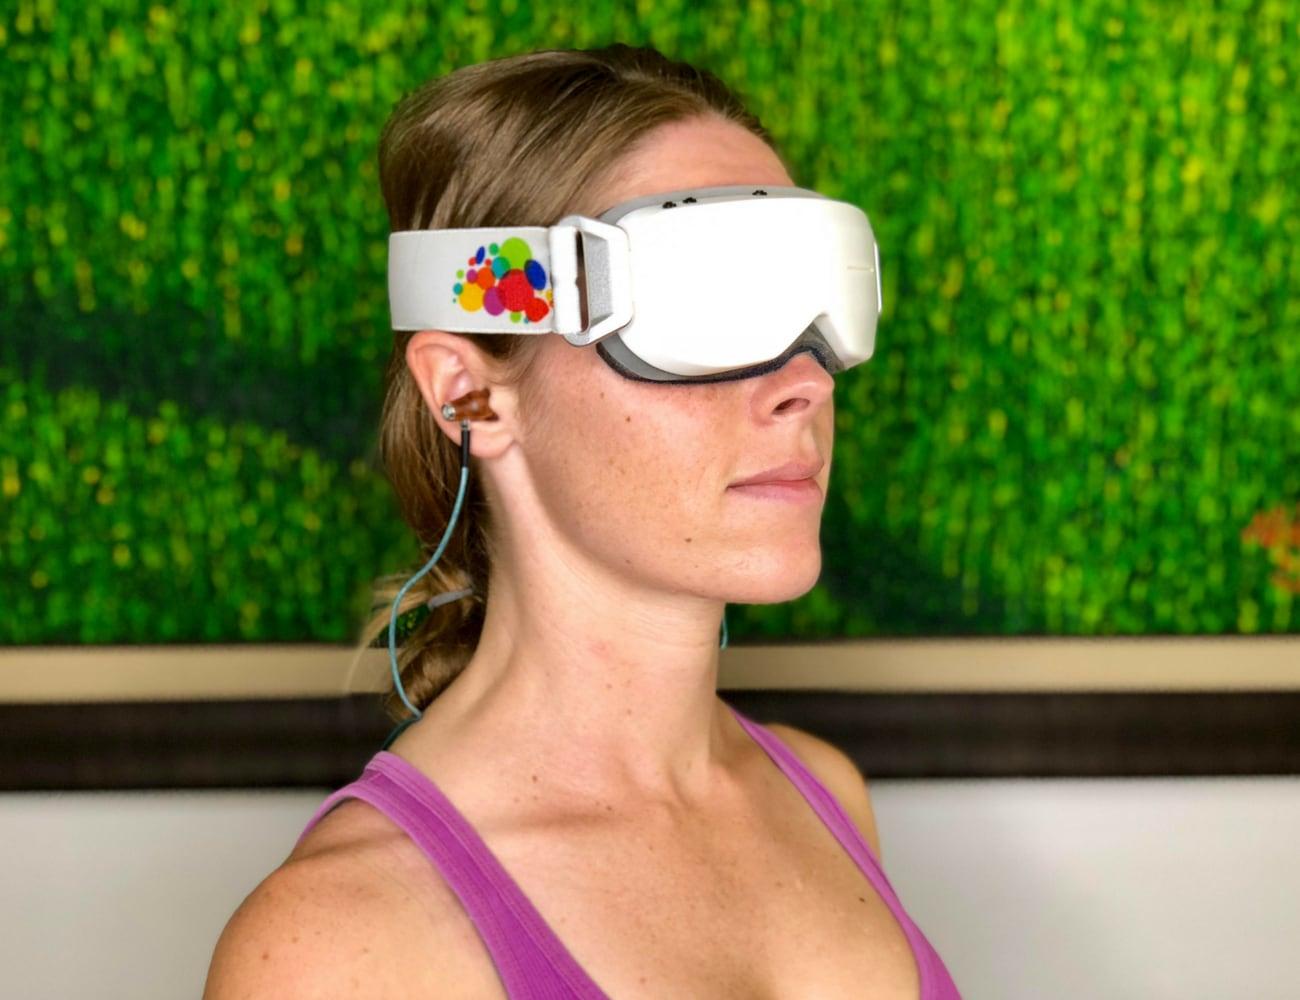 GuruGo Wearable Brain-Guiding Headset